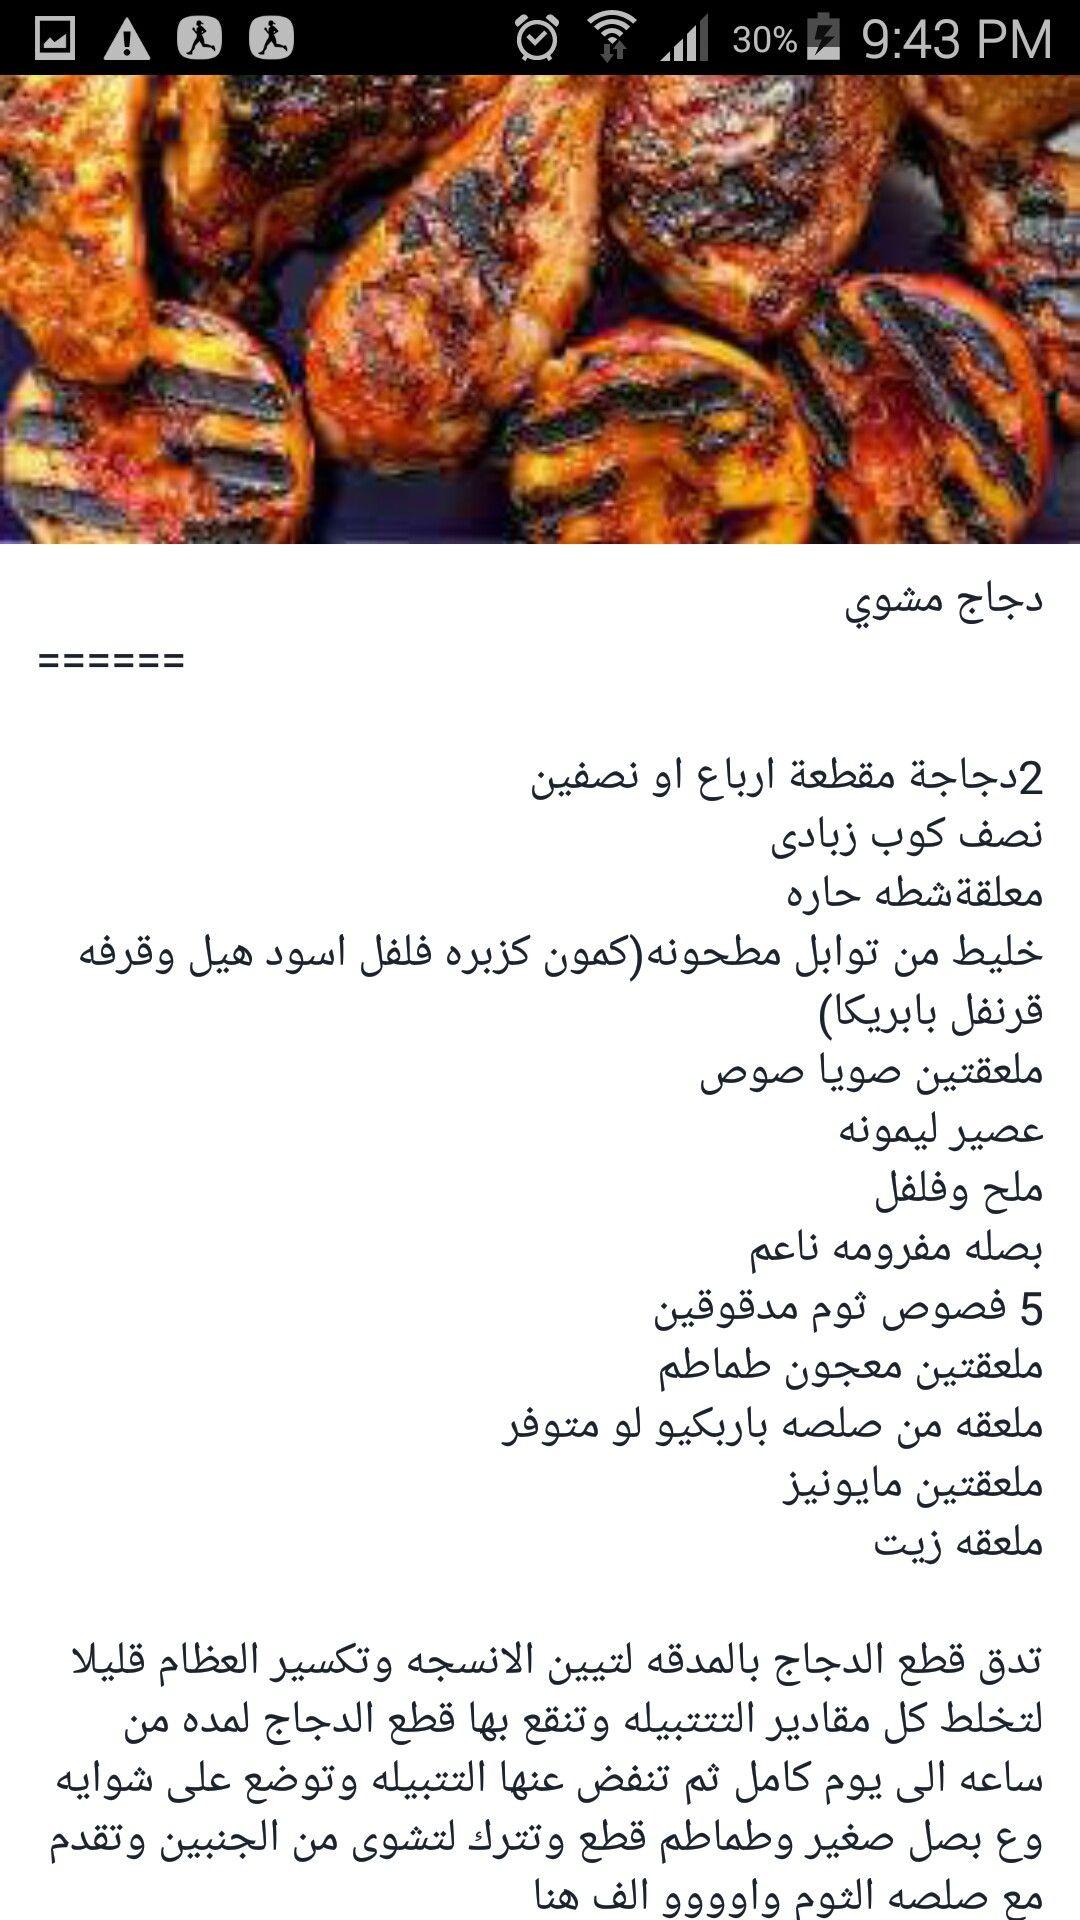 دجاج مشوى بالصويا صوص Cooking Recipes Cooking Actifry Recipes